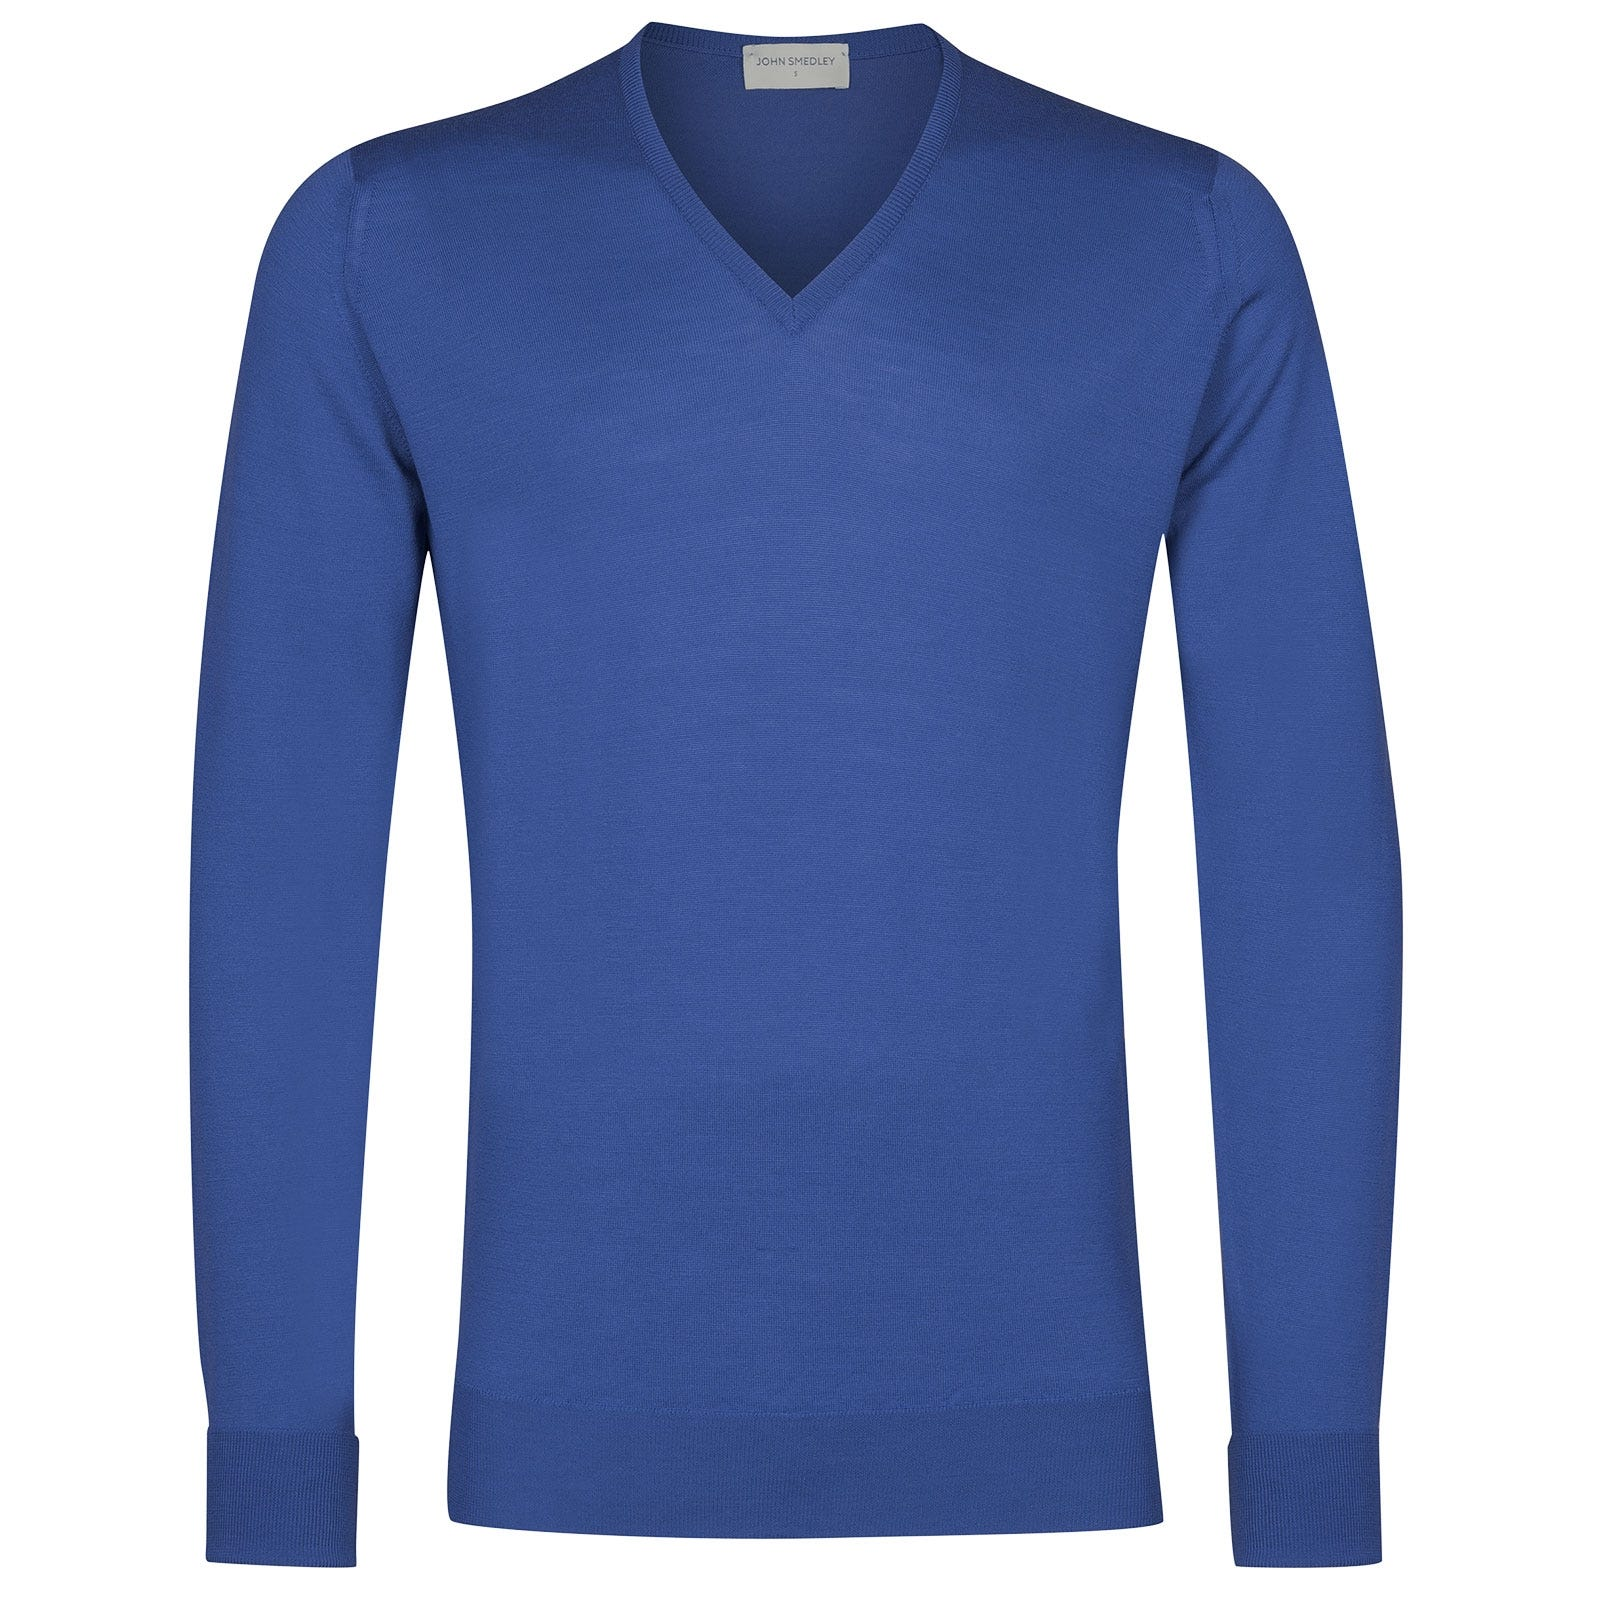 John Smedley Bobby Merino Wool Pullover in Chambray Blue-XXL